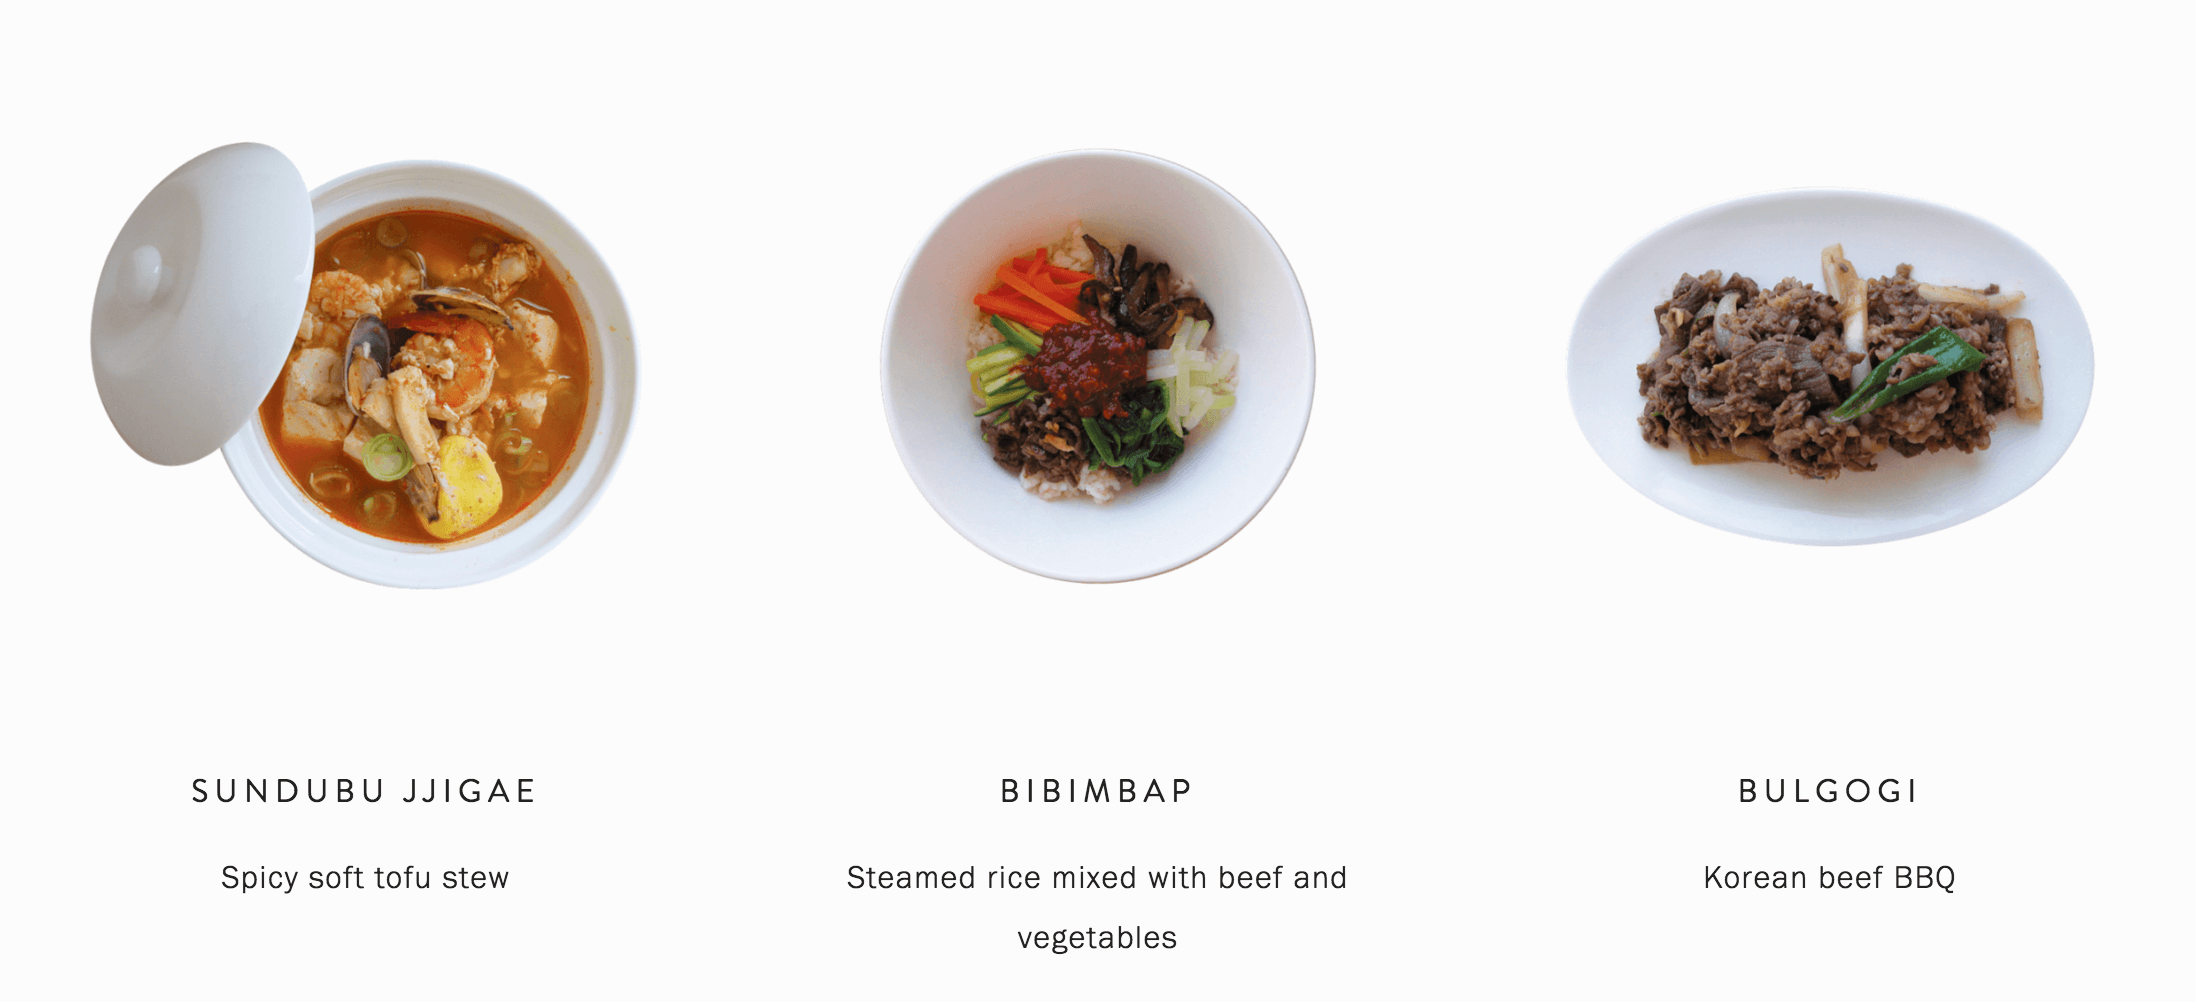 Cooking class in Seoul - Korean food Sundubu Jjigae (Soft tofu stew), Bibimbap,  Bulgogi